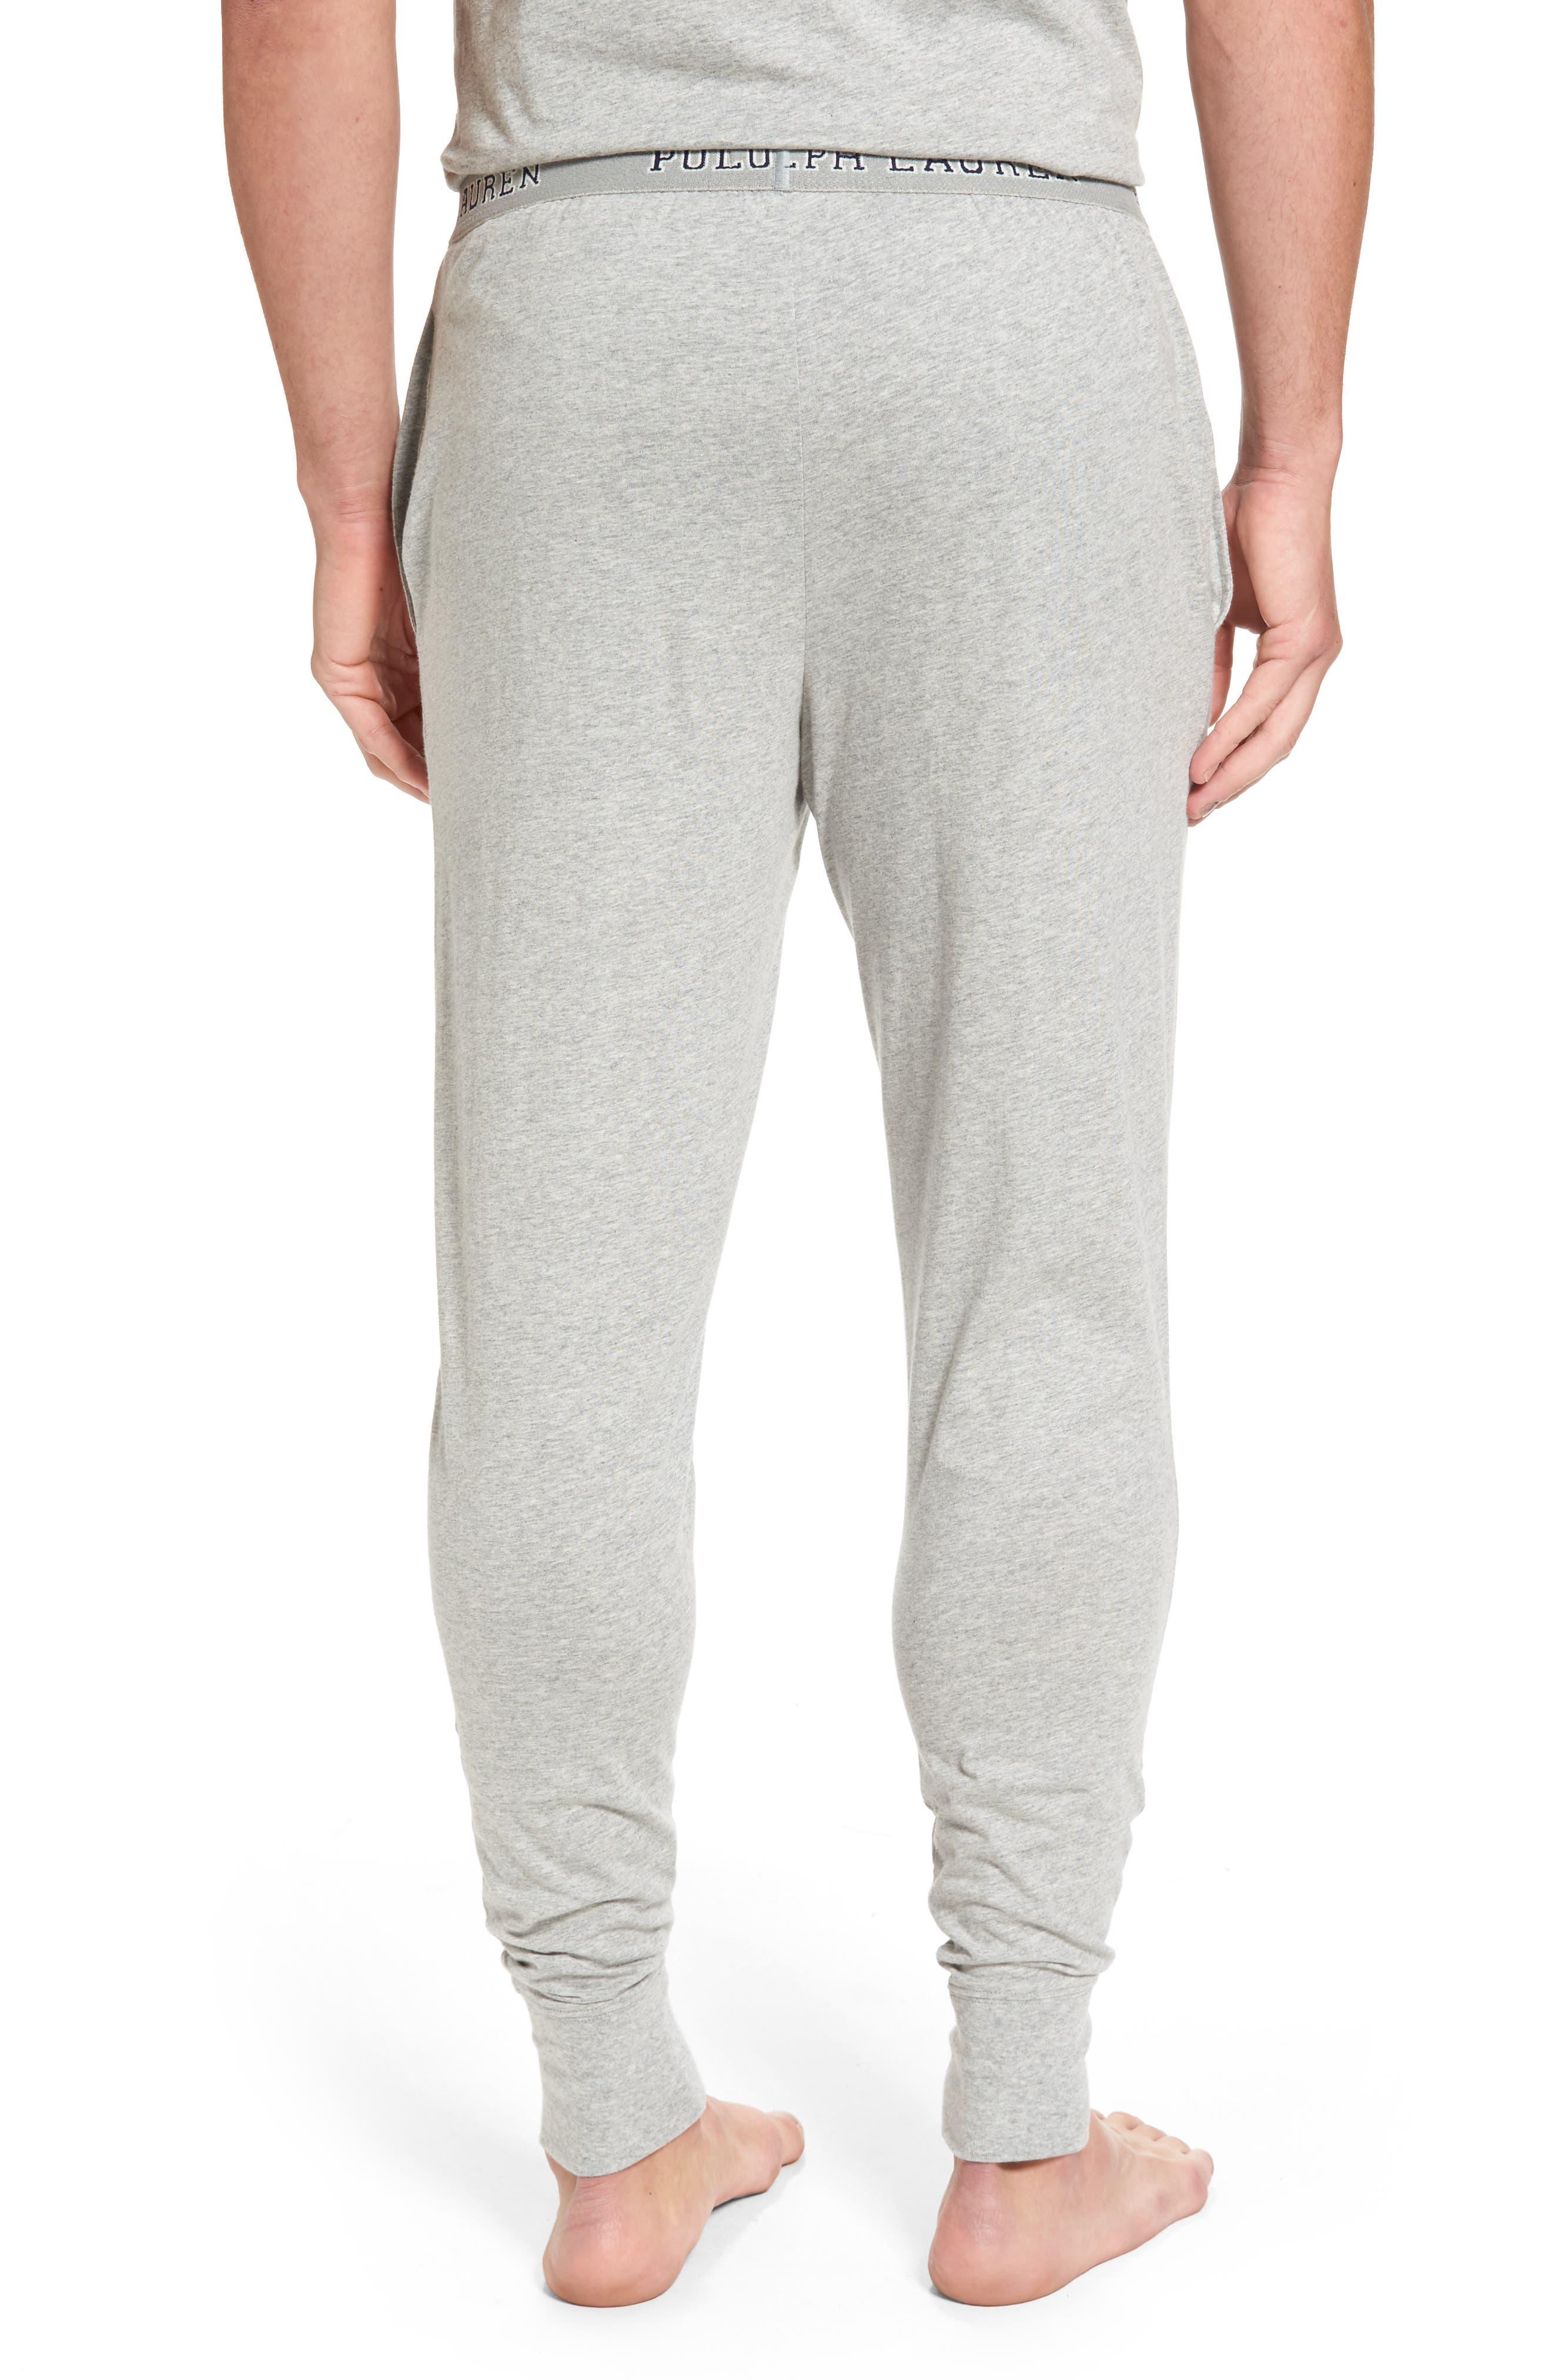 Cotton Jogger Lounge Pants,                             Alternate thumbnail 2, color,                             Andover Heather